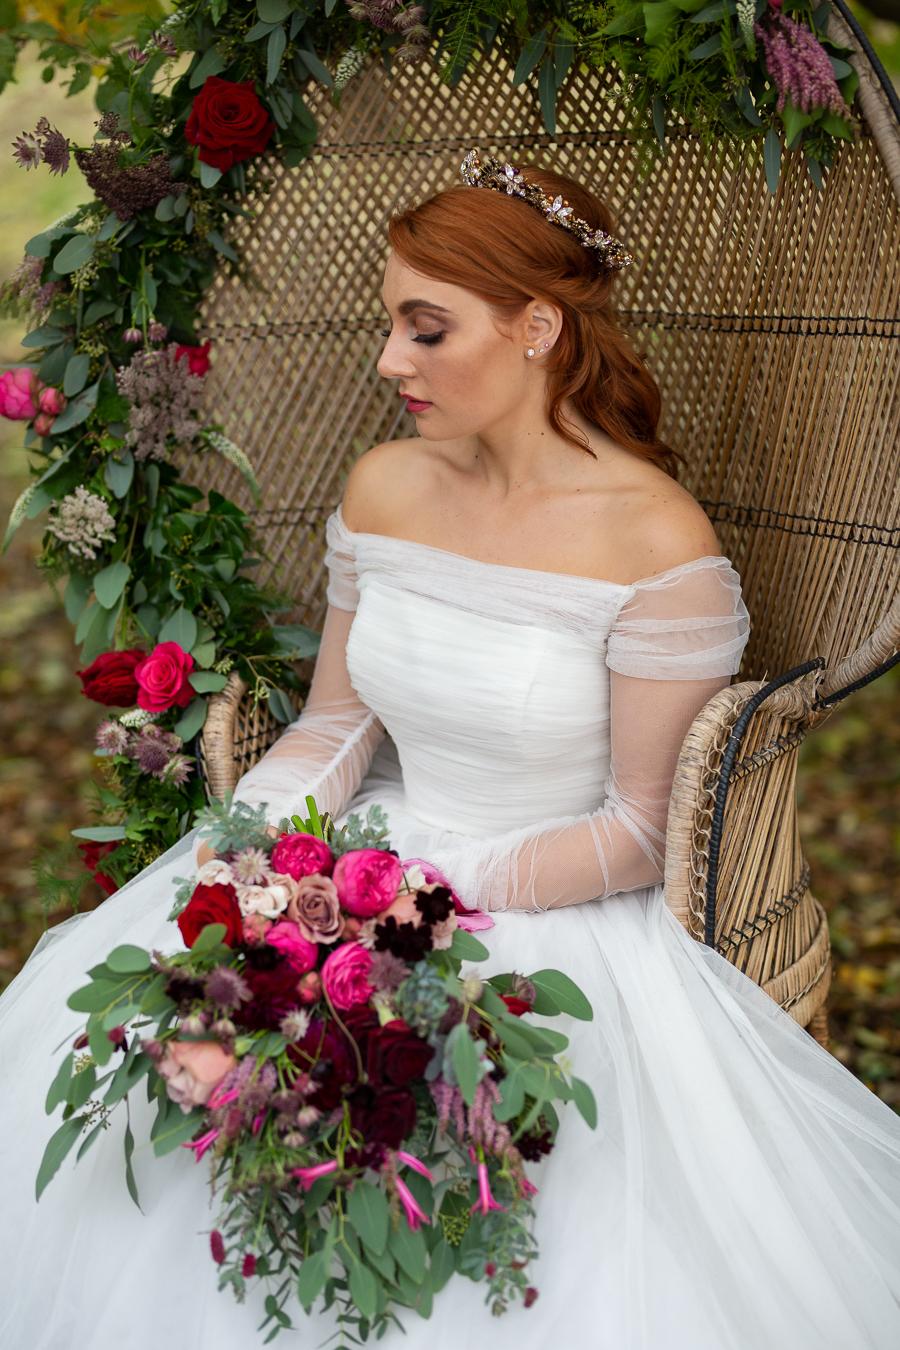 Winter woodland wedding styling ideas, image credit Photography by Chantel (24)